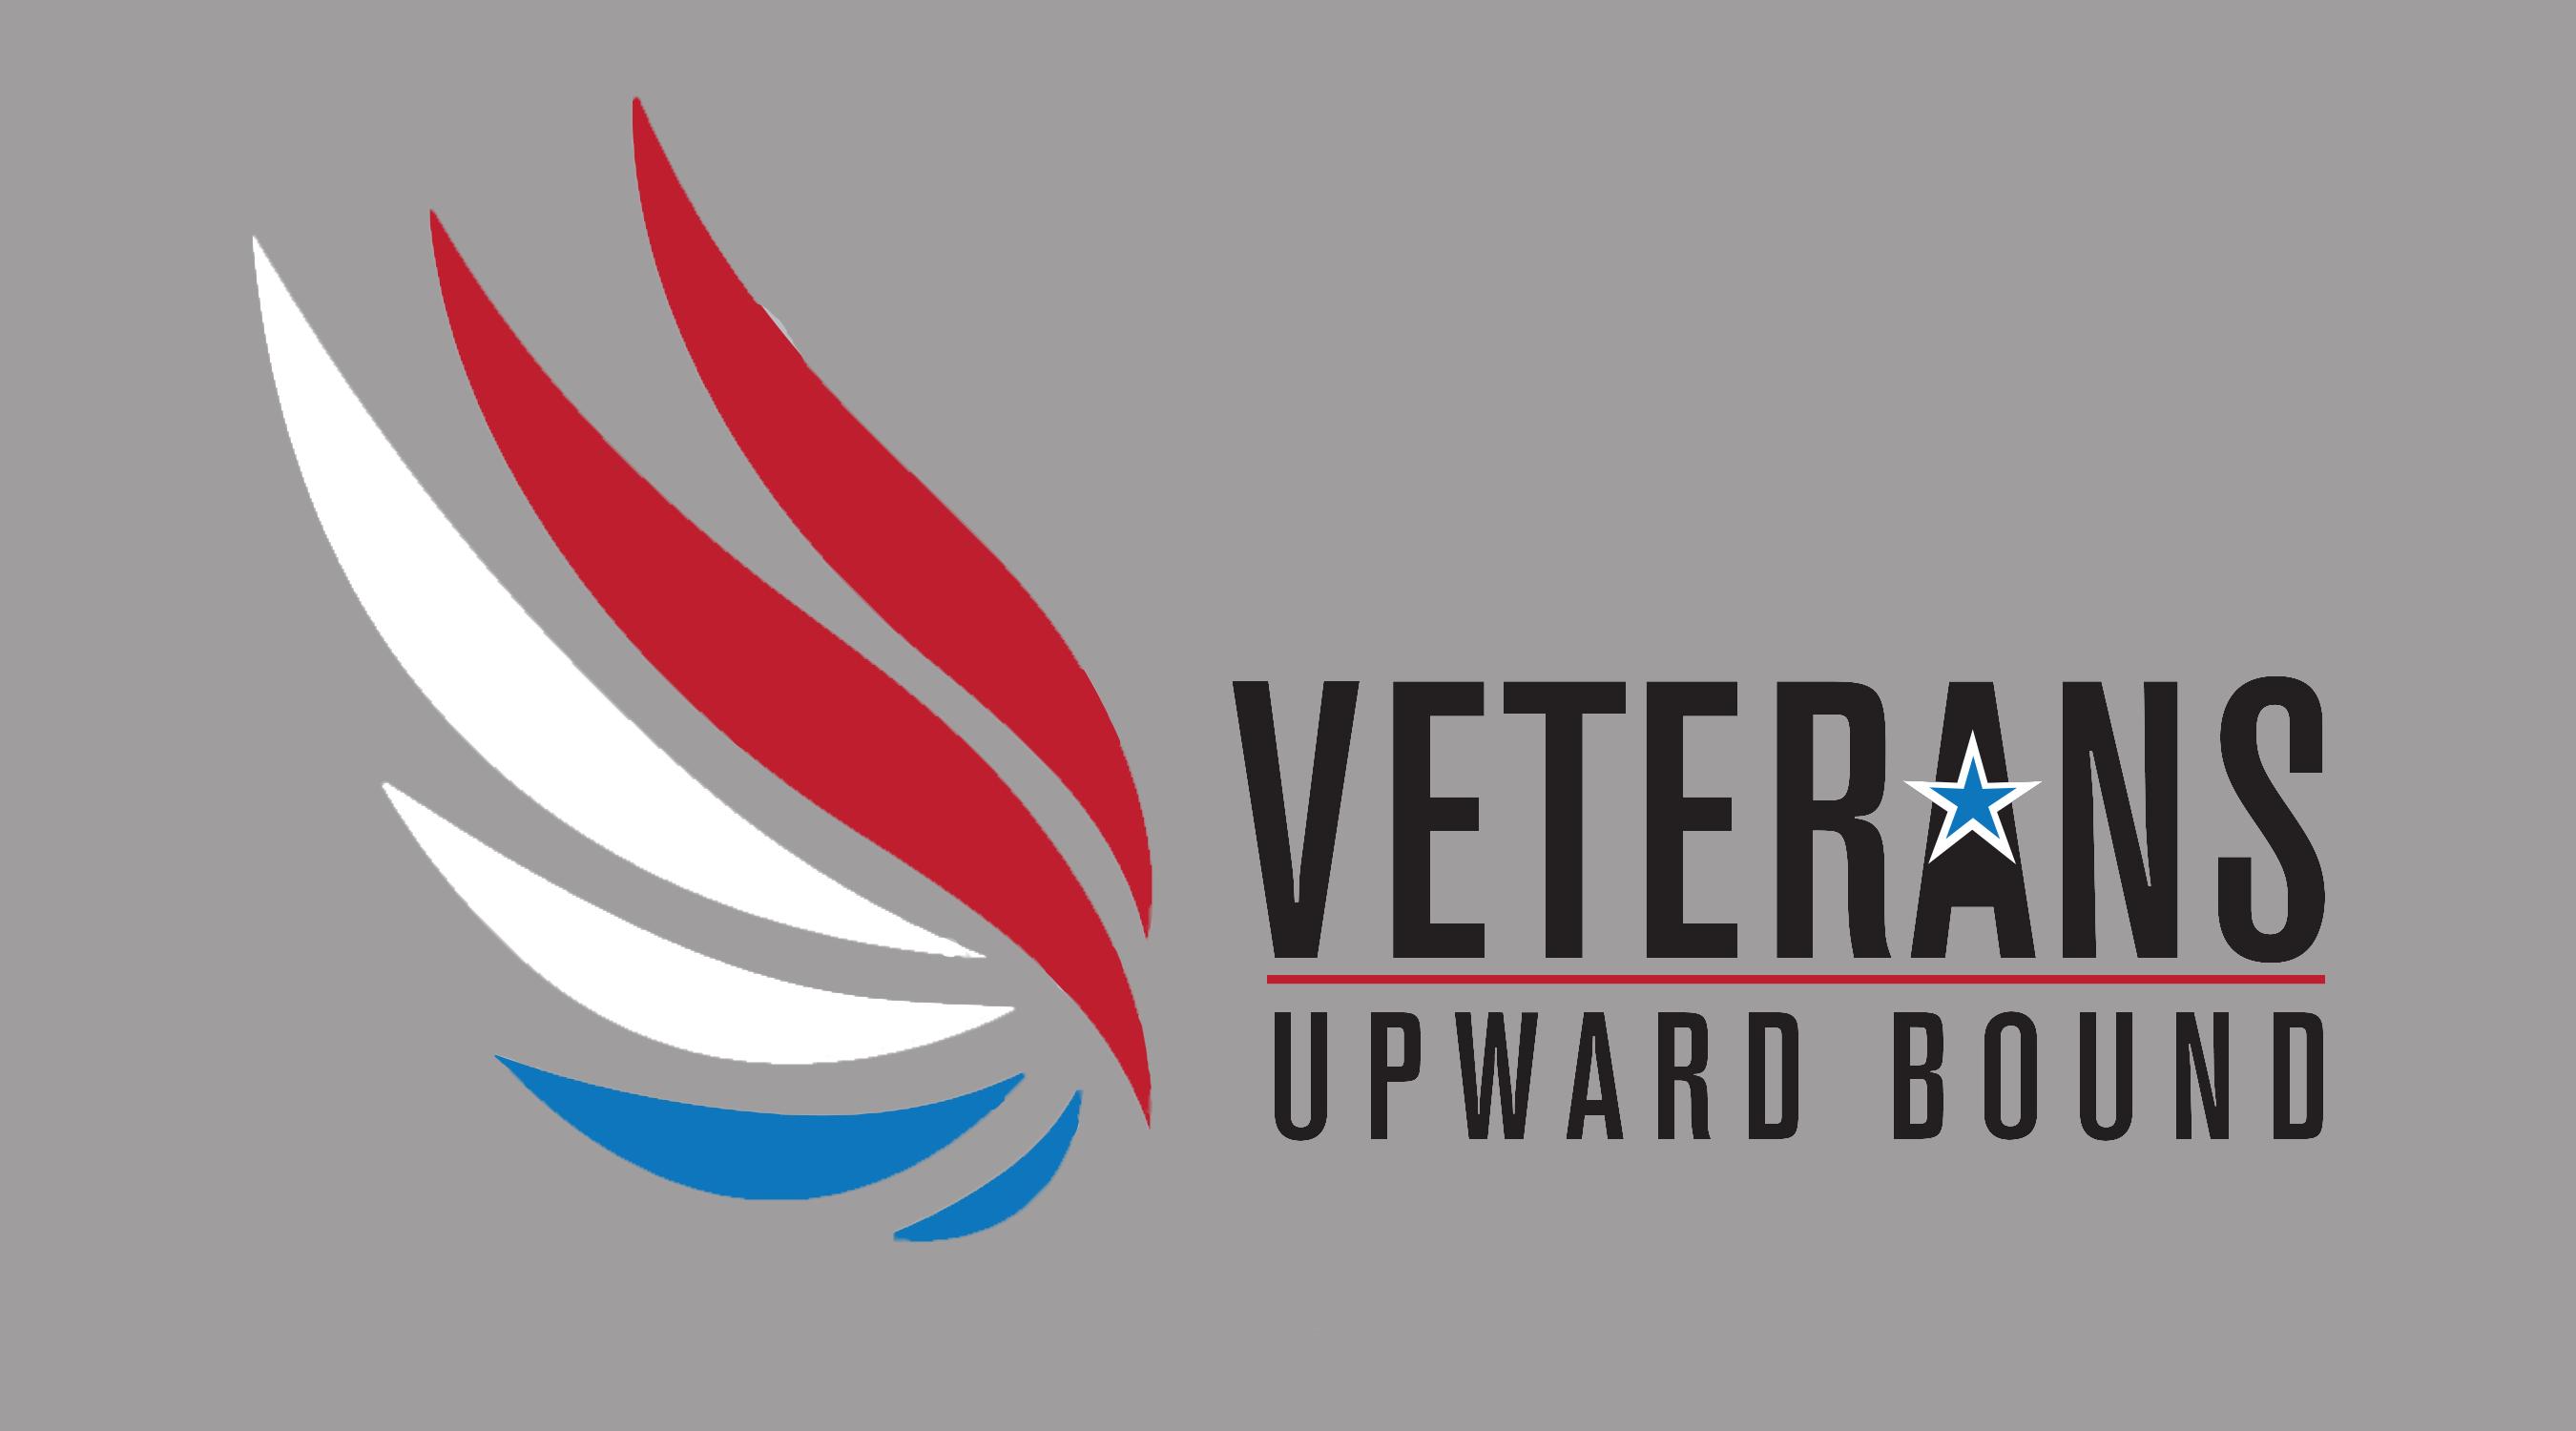 Veterans Upward Bound.